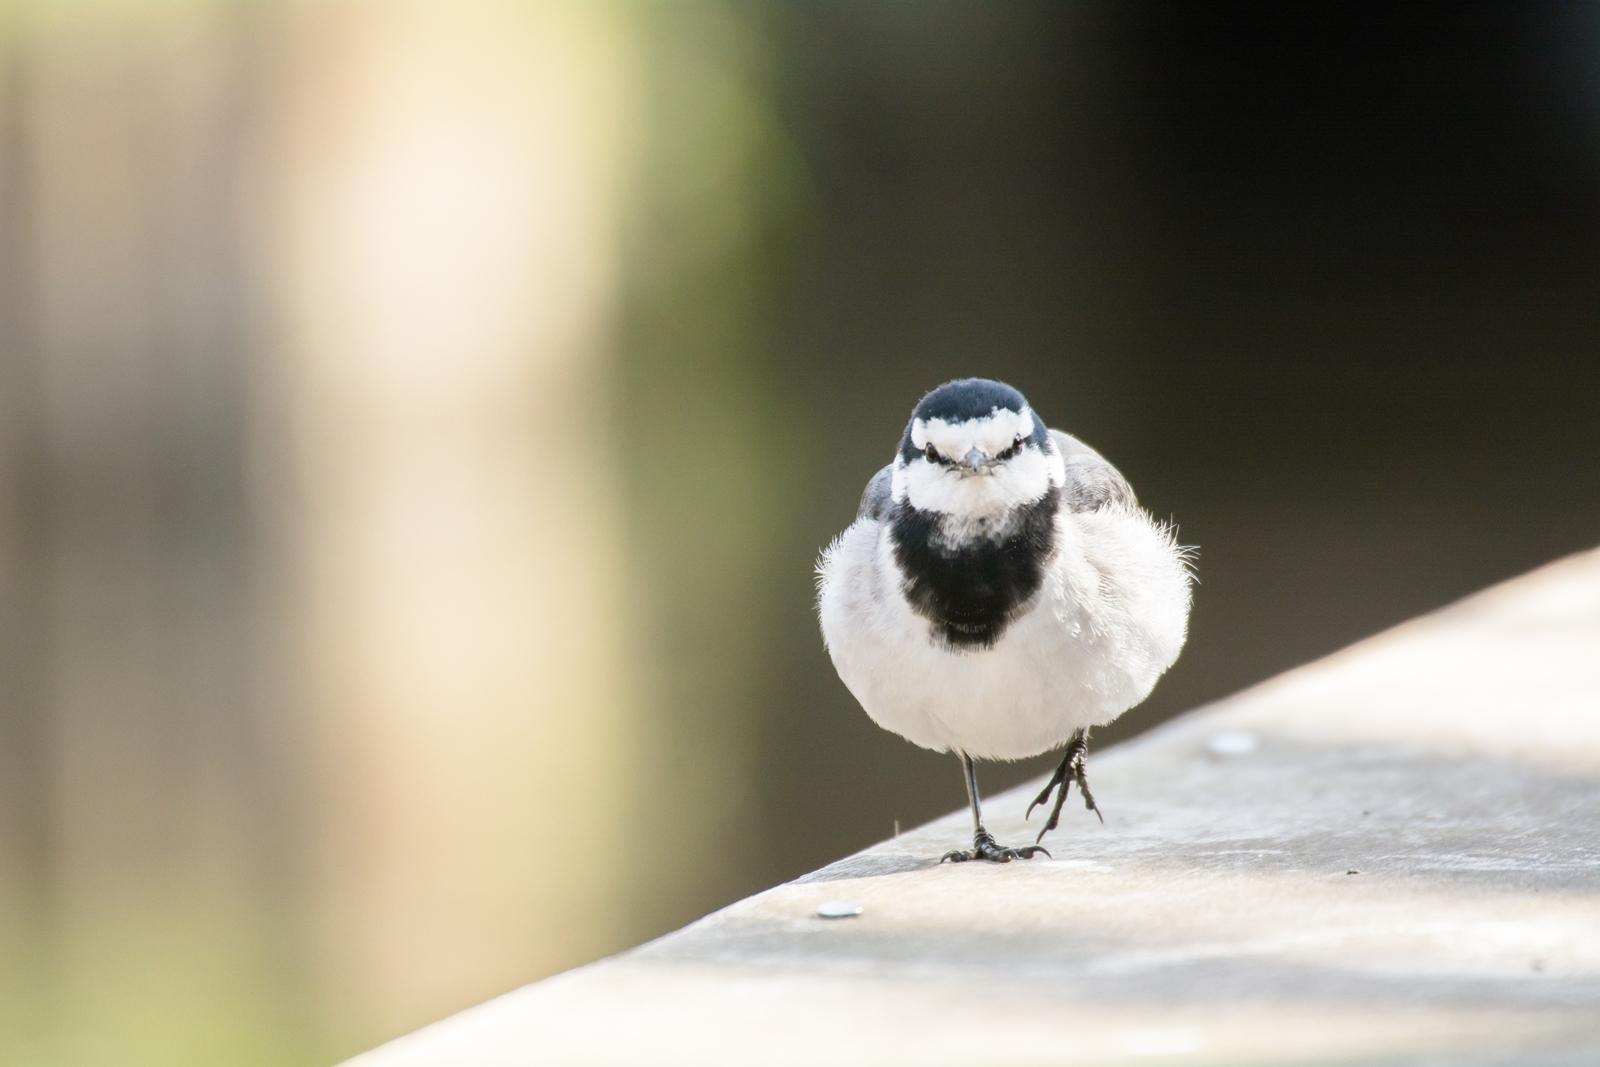 "Photo: ""進め"" ""Move forward.""  突き進む 小さな体で てくてくてくてく いつだってそう前向きに  White Wagtail. (ハクセキレイ)  #cooljapan #365cooljapanmay  #birdphotography #birds  #sigma #kawaii  #日本の写真文化を海外へ  Nikon D7100 SIGMA APO 50-500mm F5-6.3 DG OS HSM [ Day295, March 3rd ] (2枚追加:Added 2 photo)  小鳥の詩朗読 http://youtu.be/DEAoU92Go7U?list=PL2YtHGm0-R3qVsaqvQe9OYdJFCkI98wzF"